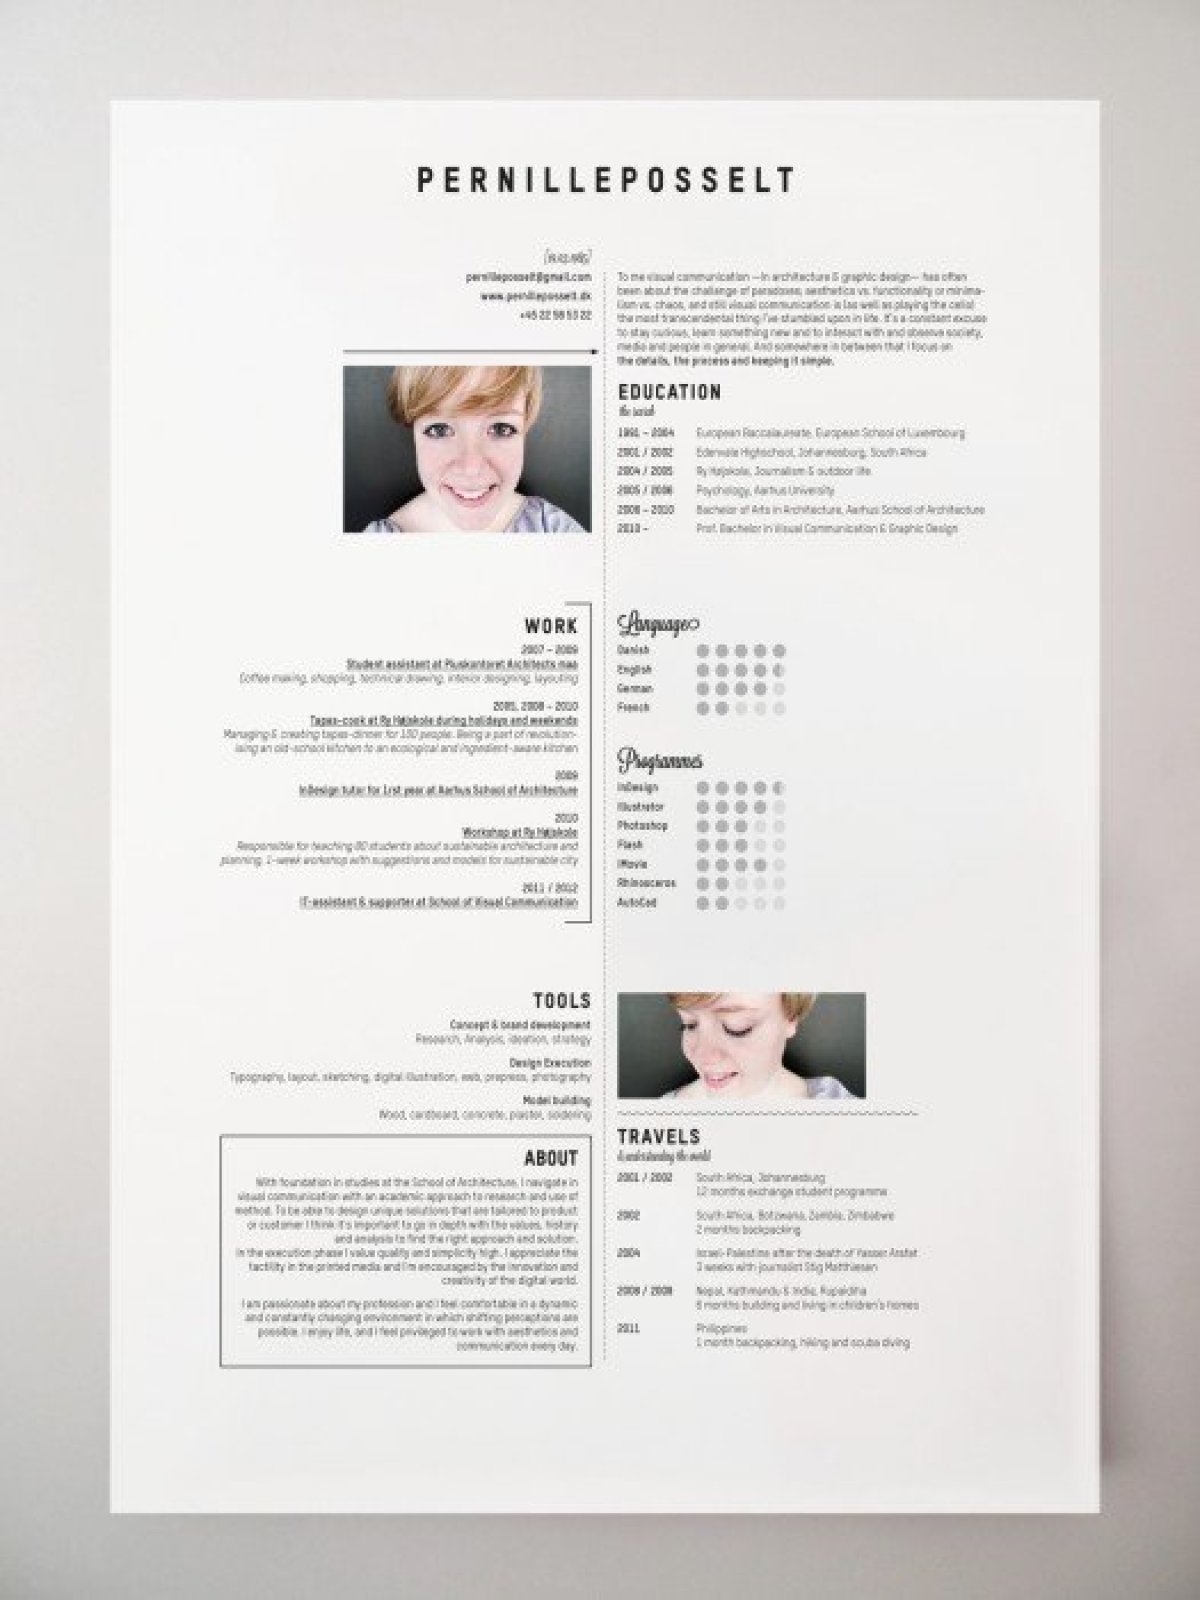 34033fea4ad82bdc56951395ec3a06b4 10 creative cv และ resume ที่สร้างตัวเองโดดเด่น